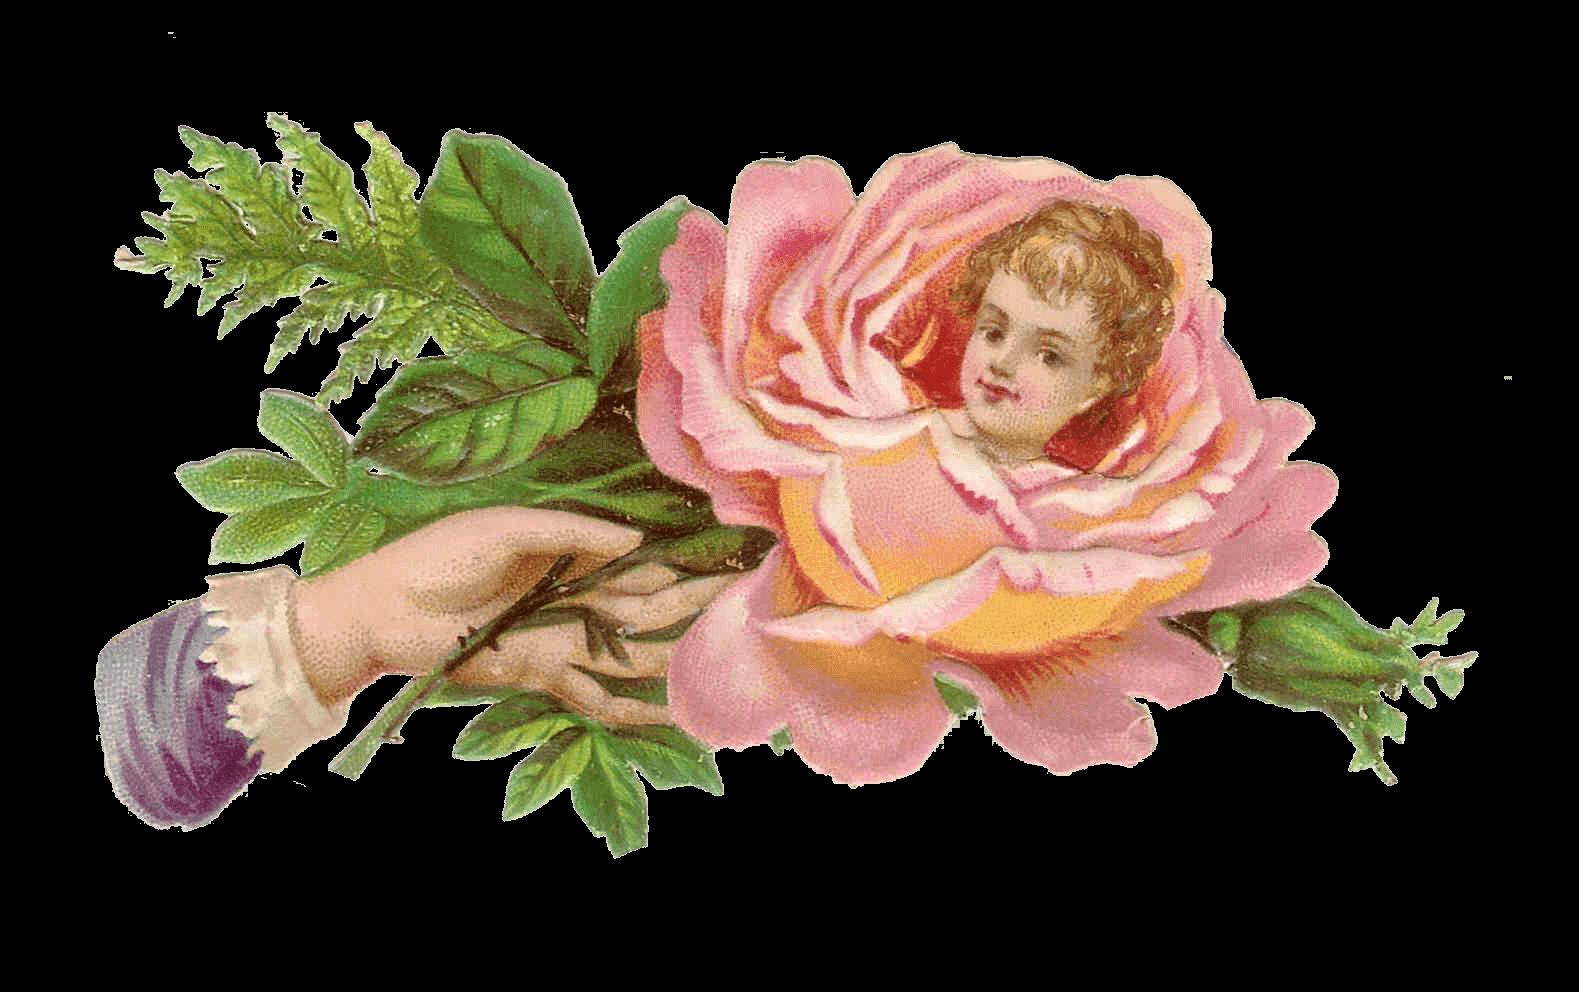 Child victorian hand transparent. Hands clipart flower